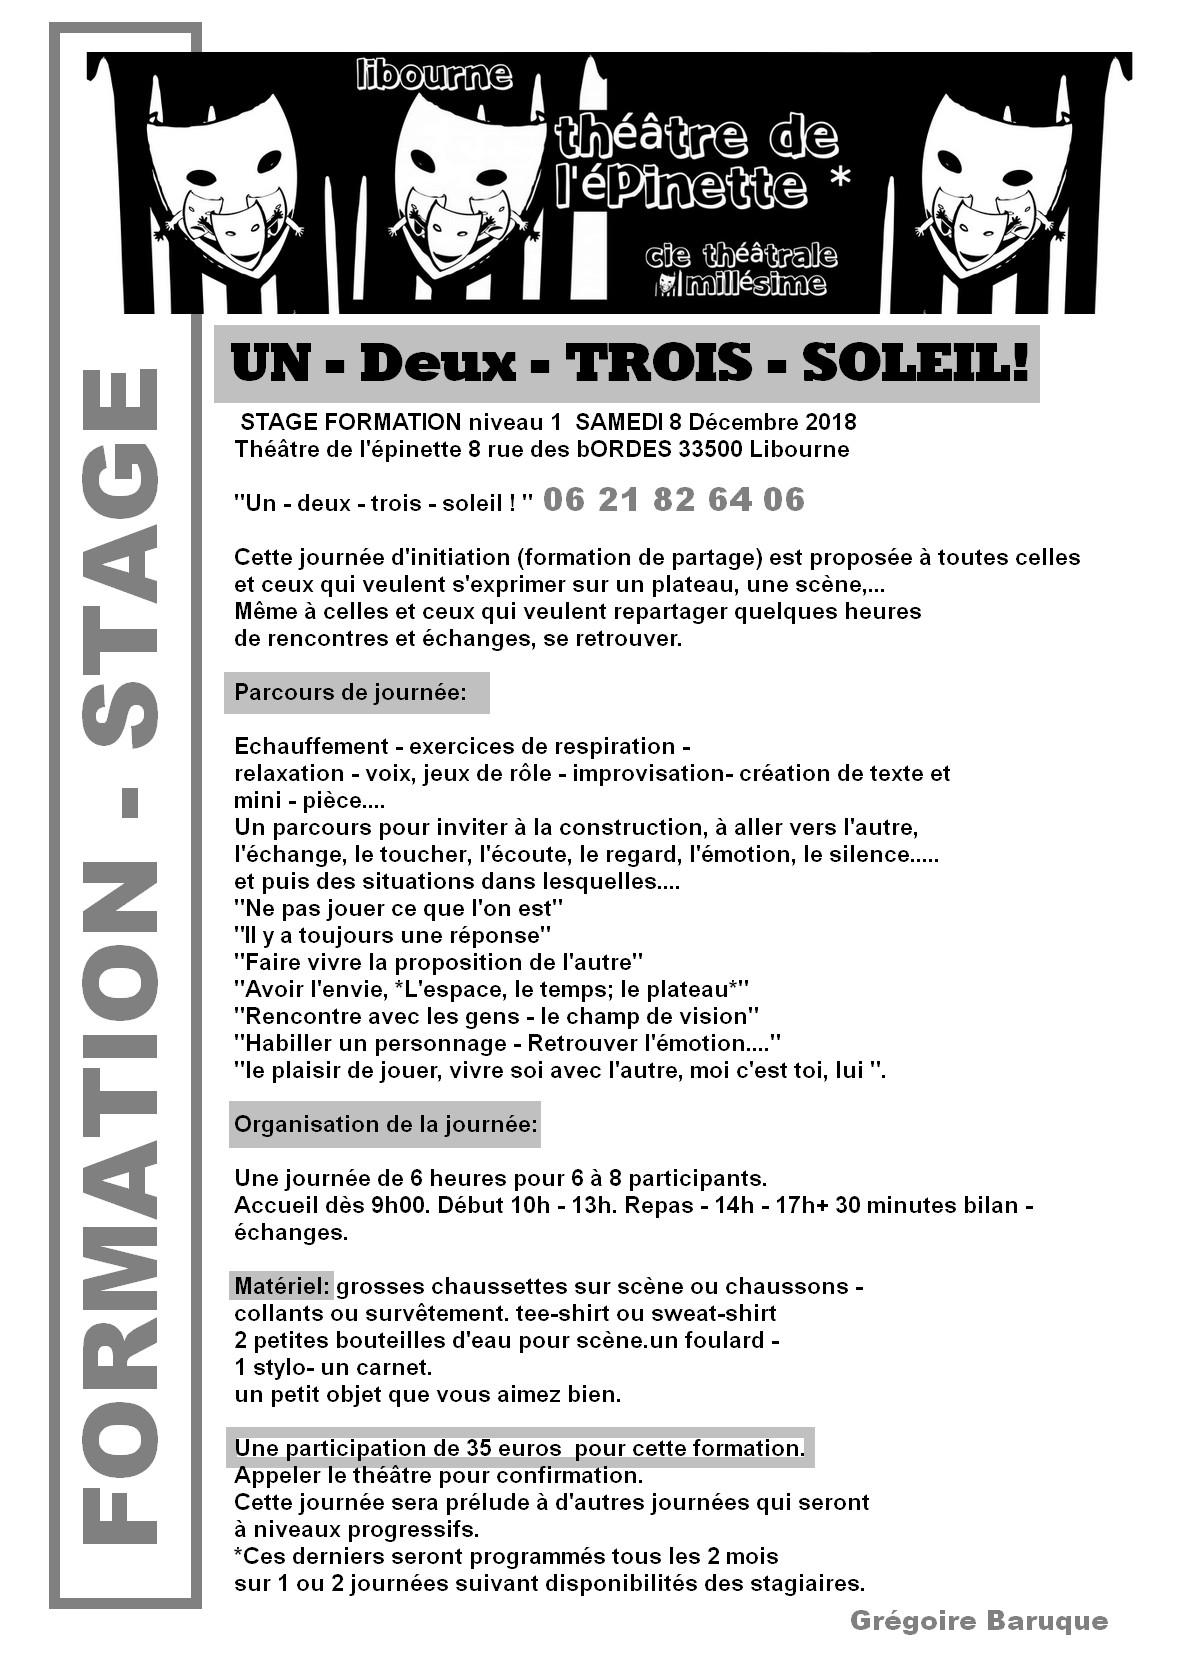 Formation stage thetre epinette 8 decembre 2018